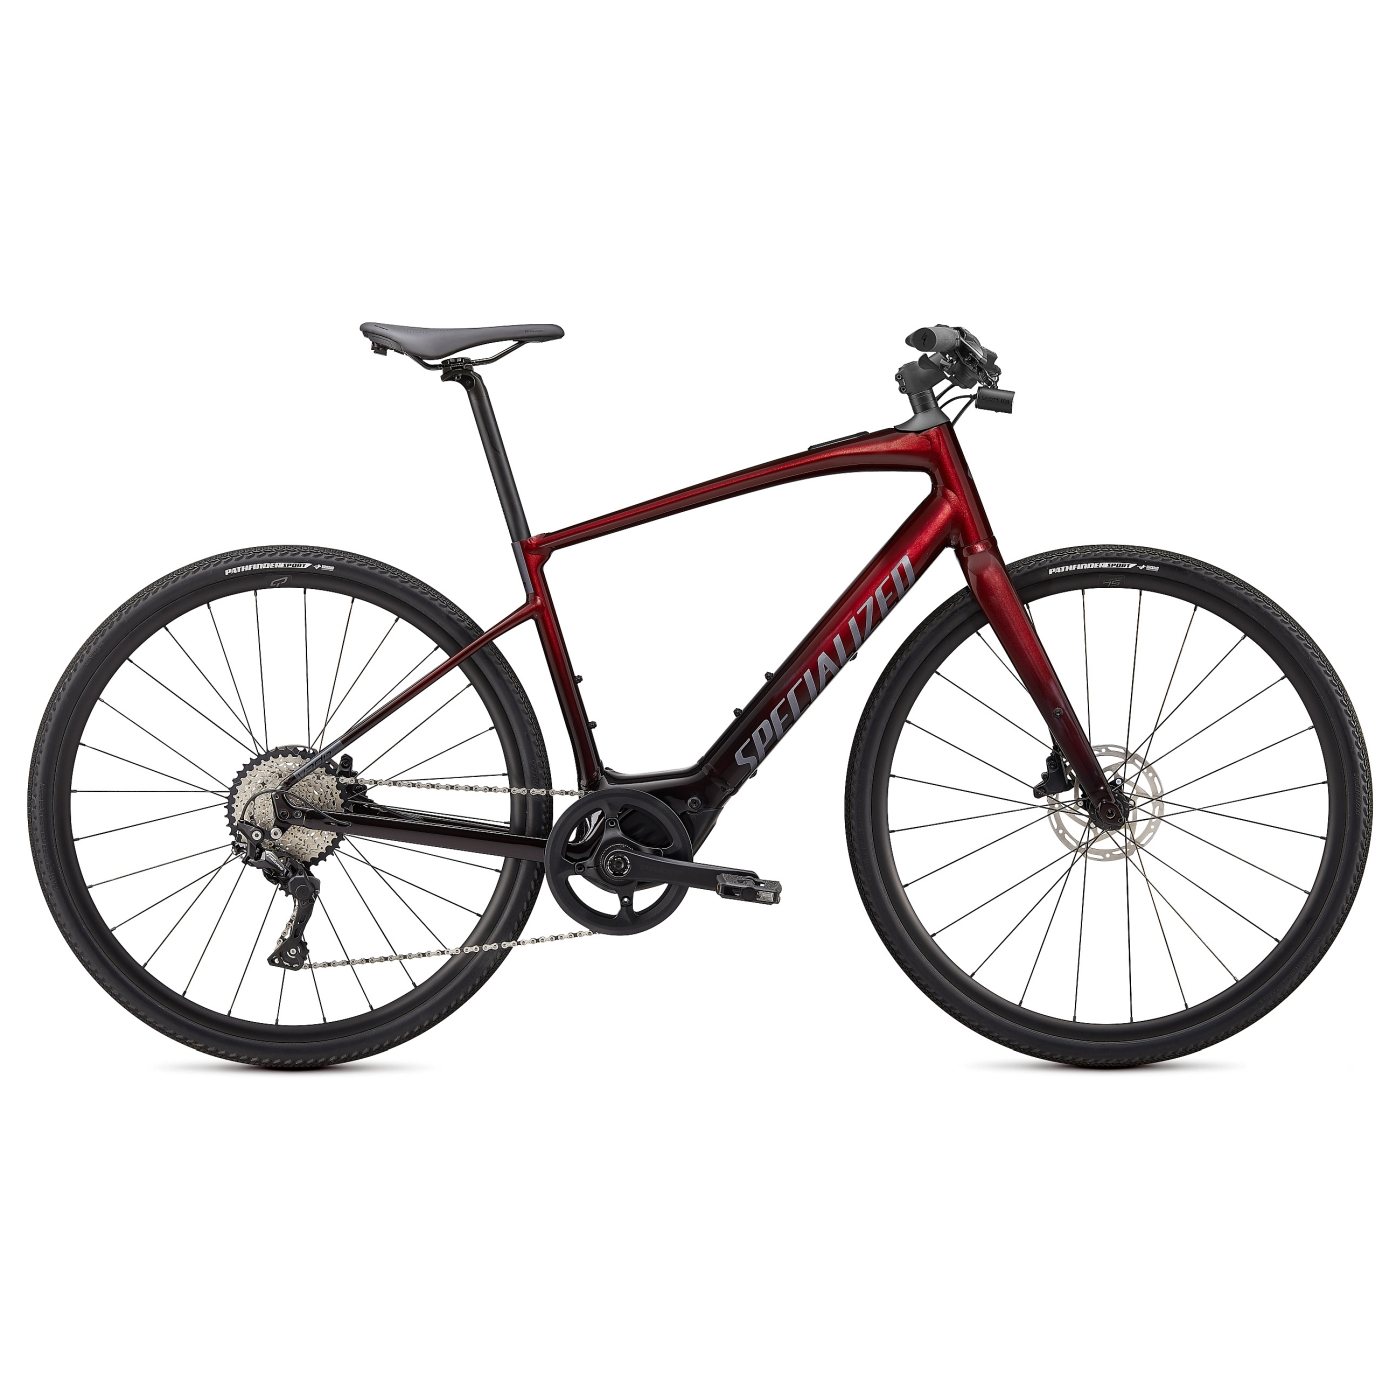 Produktbild von Specialized TURBO VADO SL 4.0 E-Bike - 2021 - crimson red tint/black